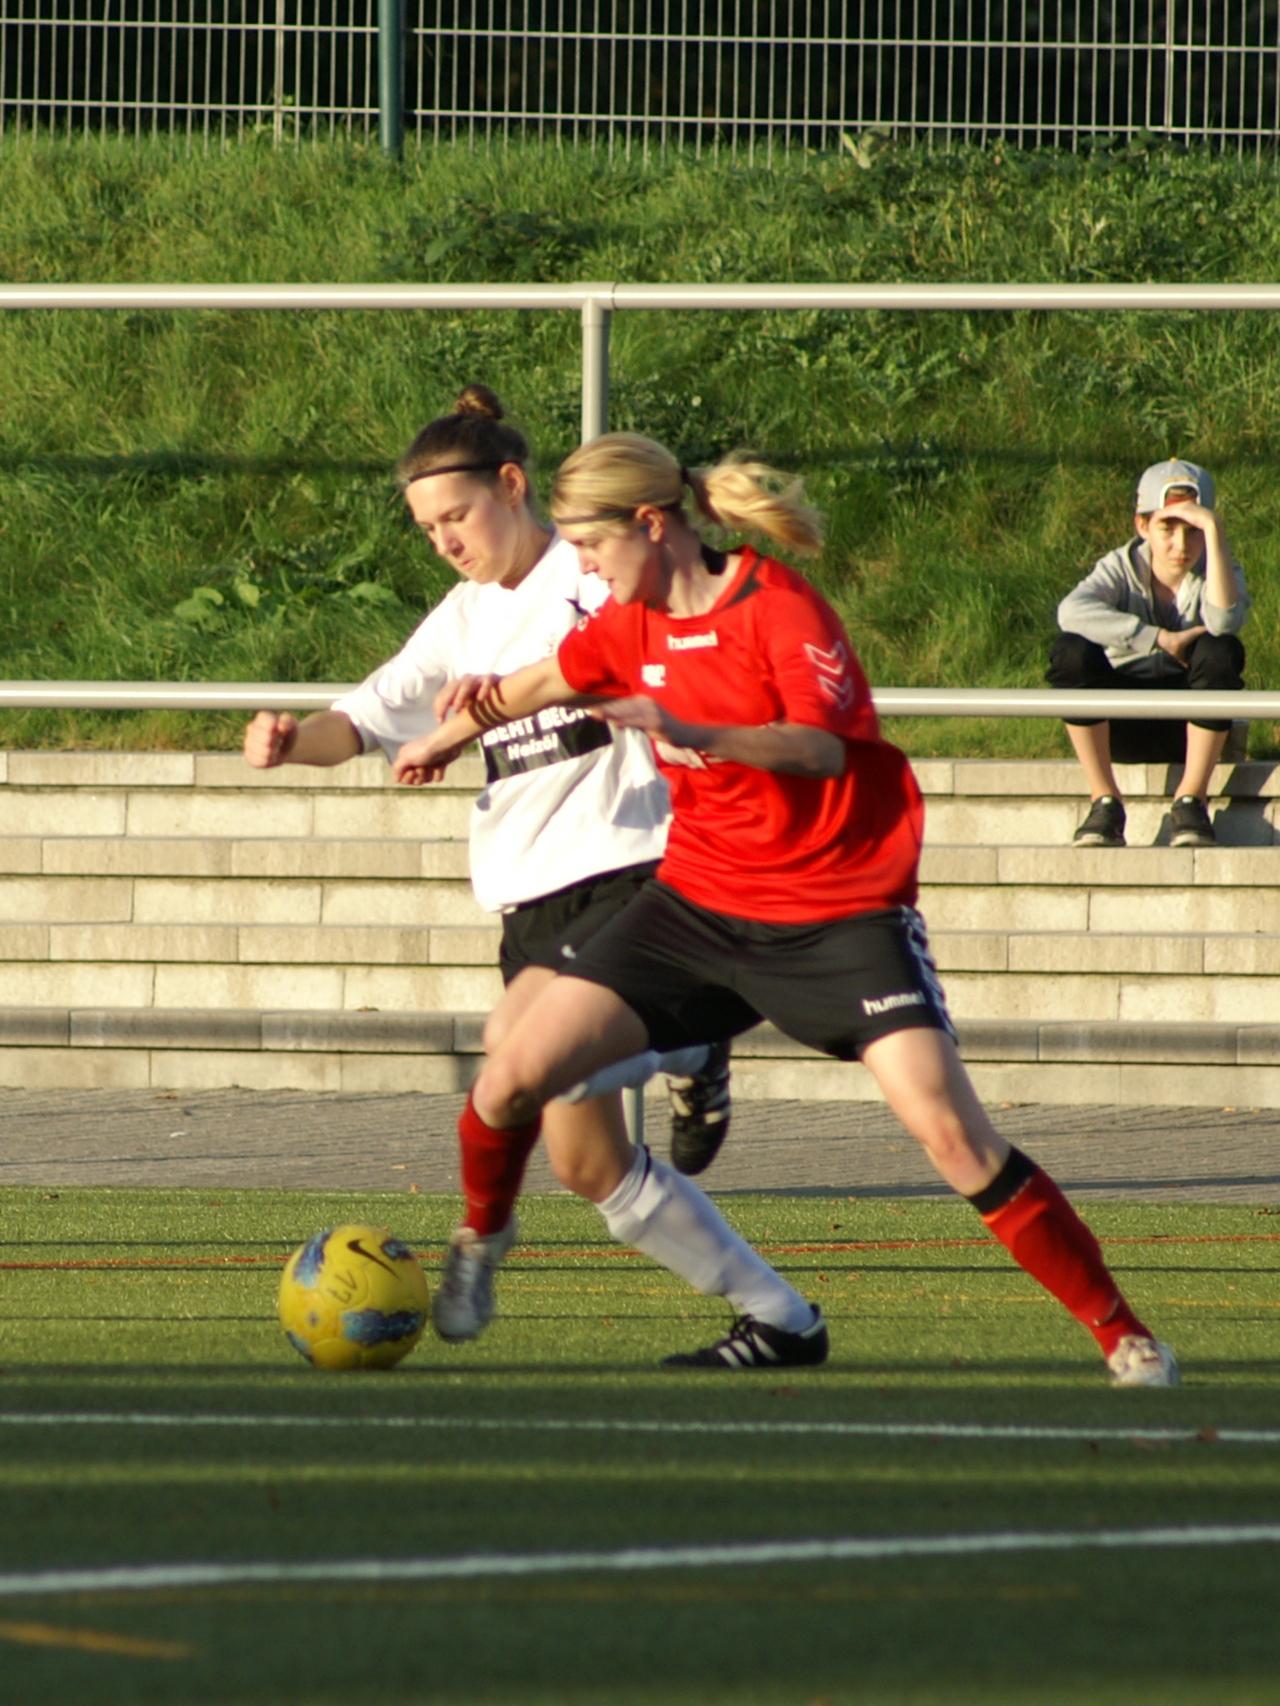 KSV Hessen Frauen - SV Kathus: Doppeltorsch�tzin Laura Wickert (in wei�) im Zweikampf